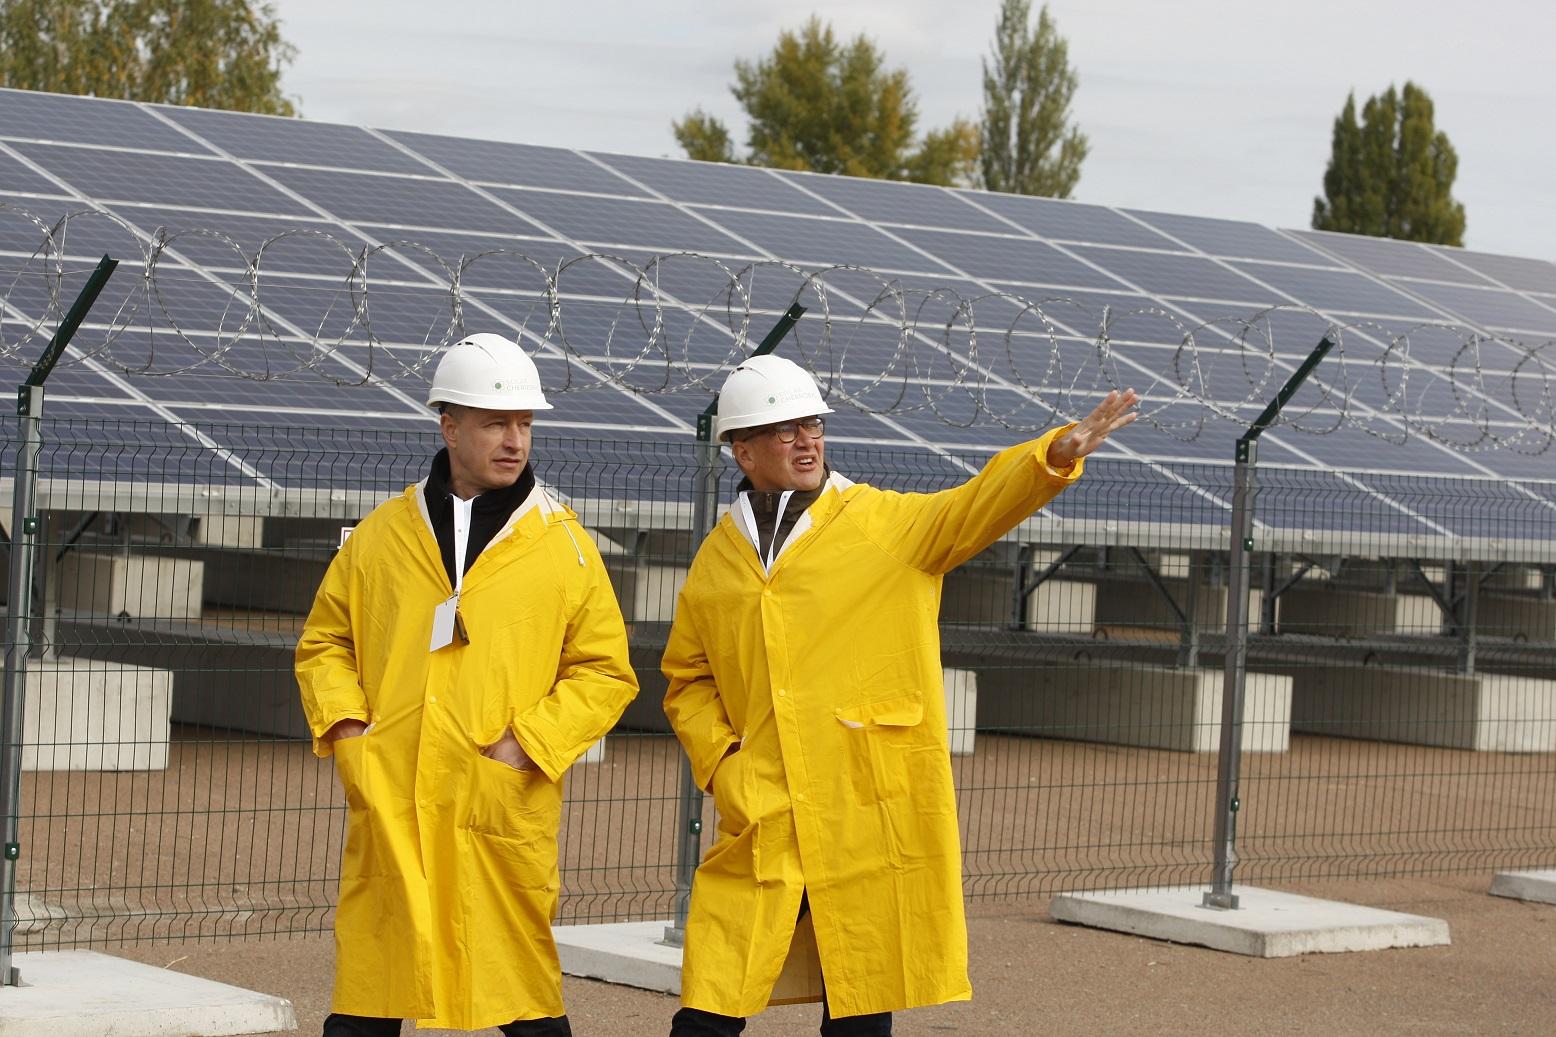 A primeira usina solar de Chernobil fica a 14 quilômetros da antiga usina nuclear. Foto STR/NurPhoto